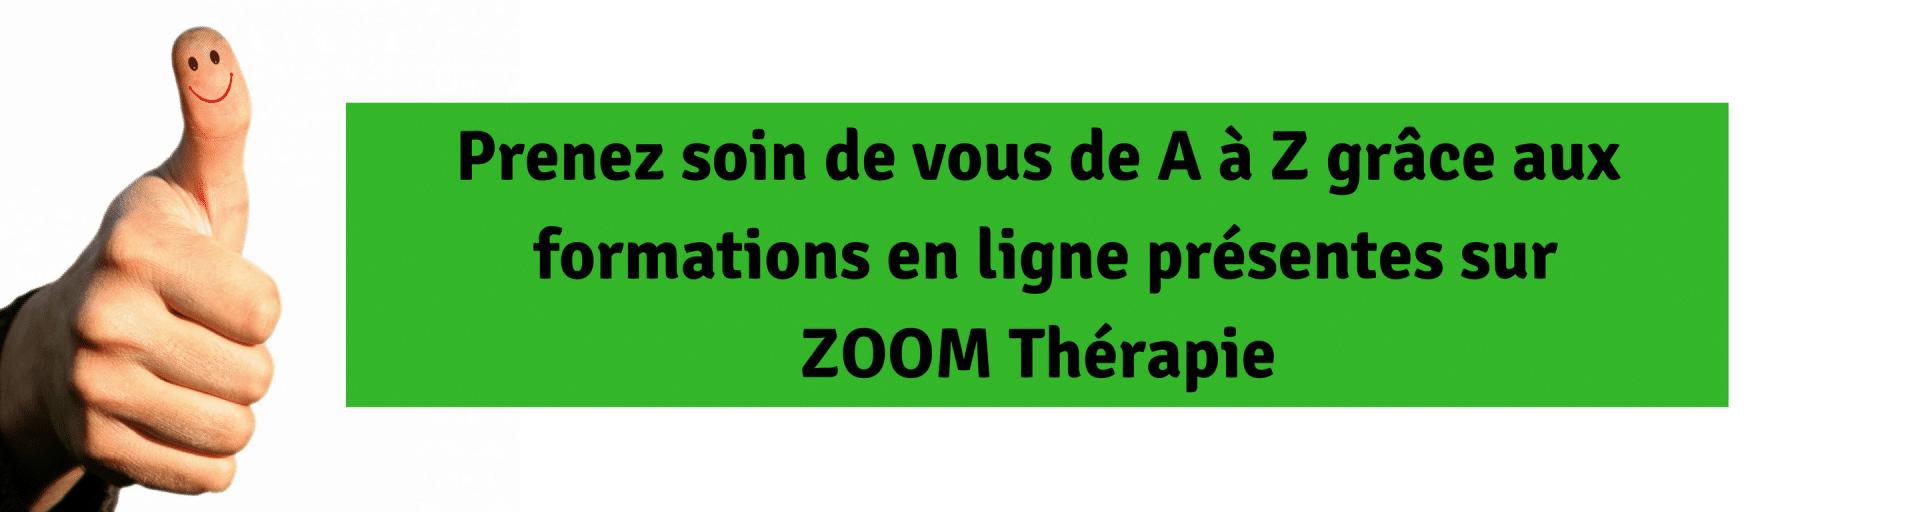 Zoom Thérapie